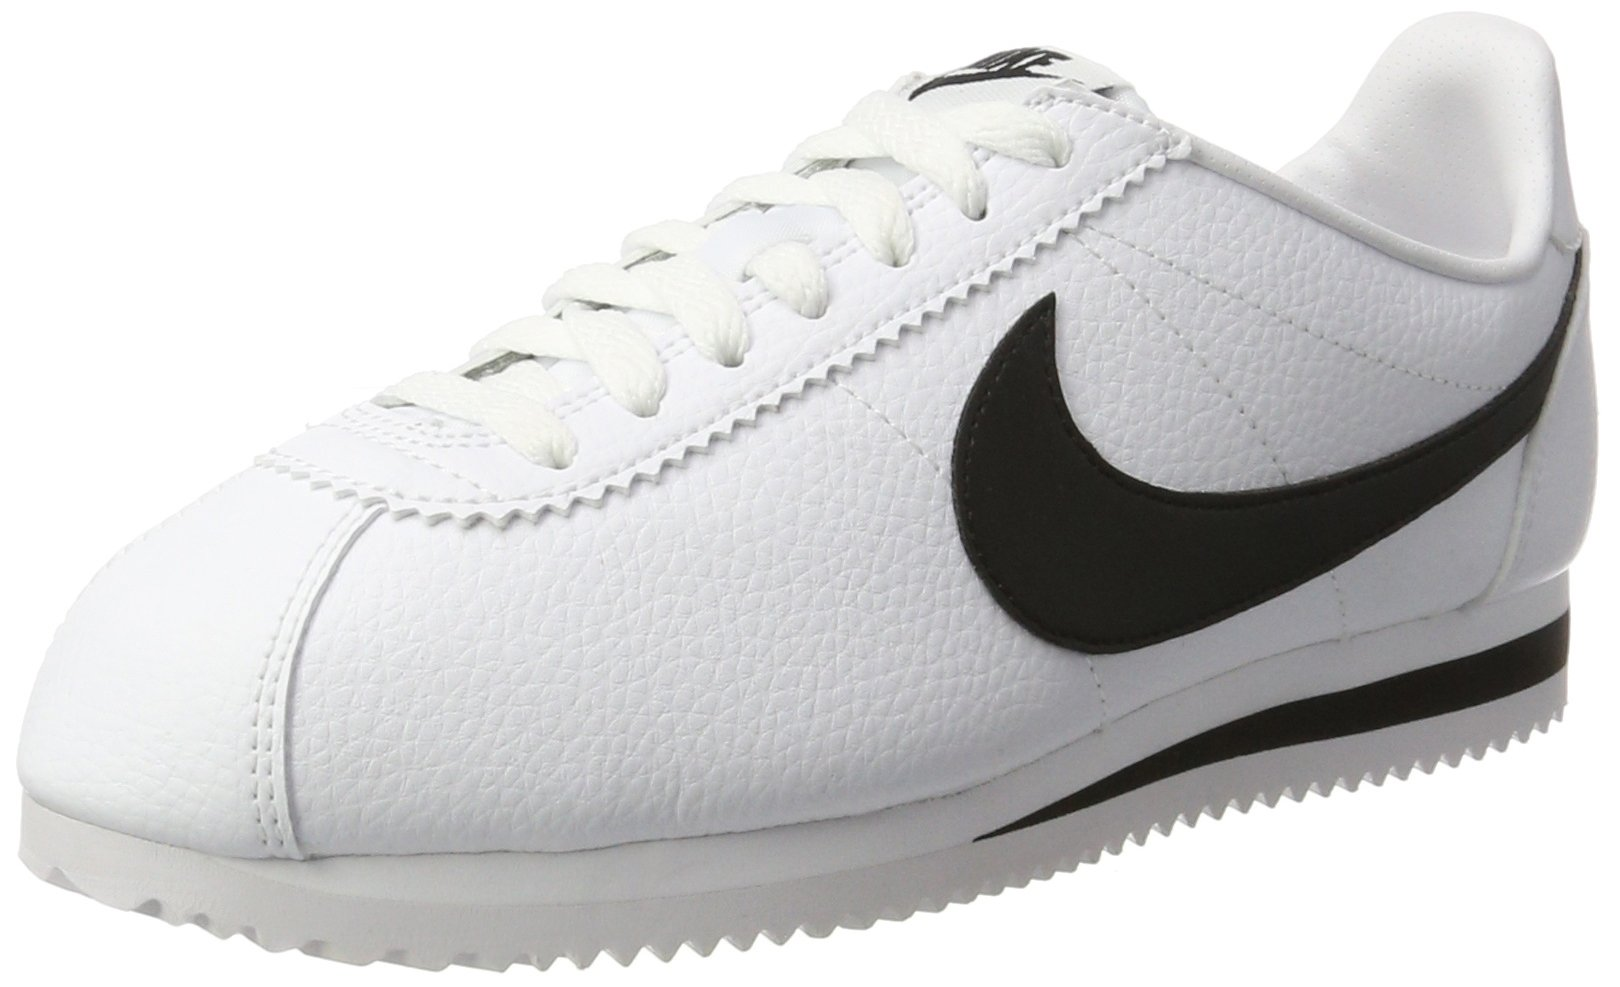 meet 64b3f 9a8ef Nike Mens Classic Cortez White Black Leather Trainers 46 EU